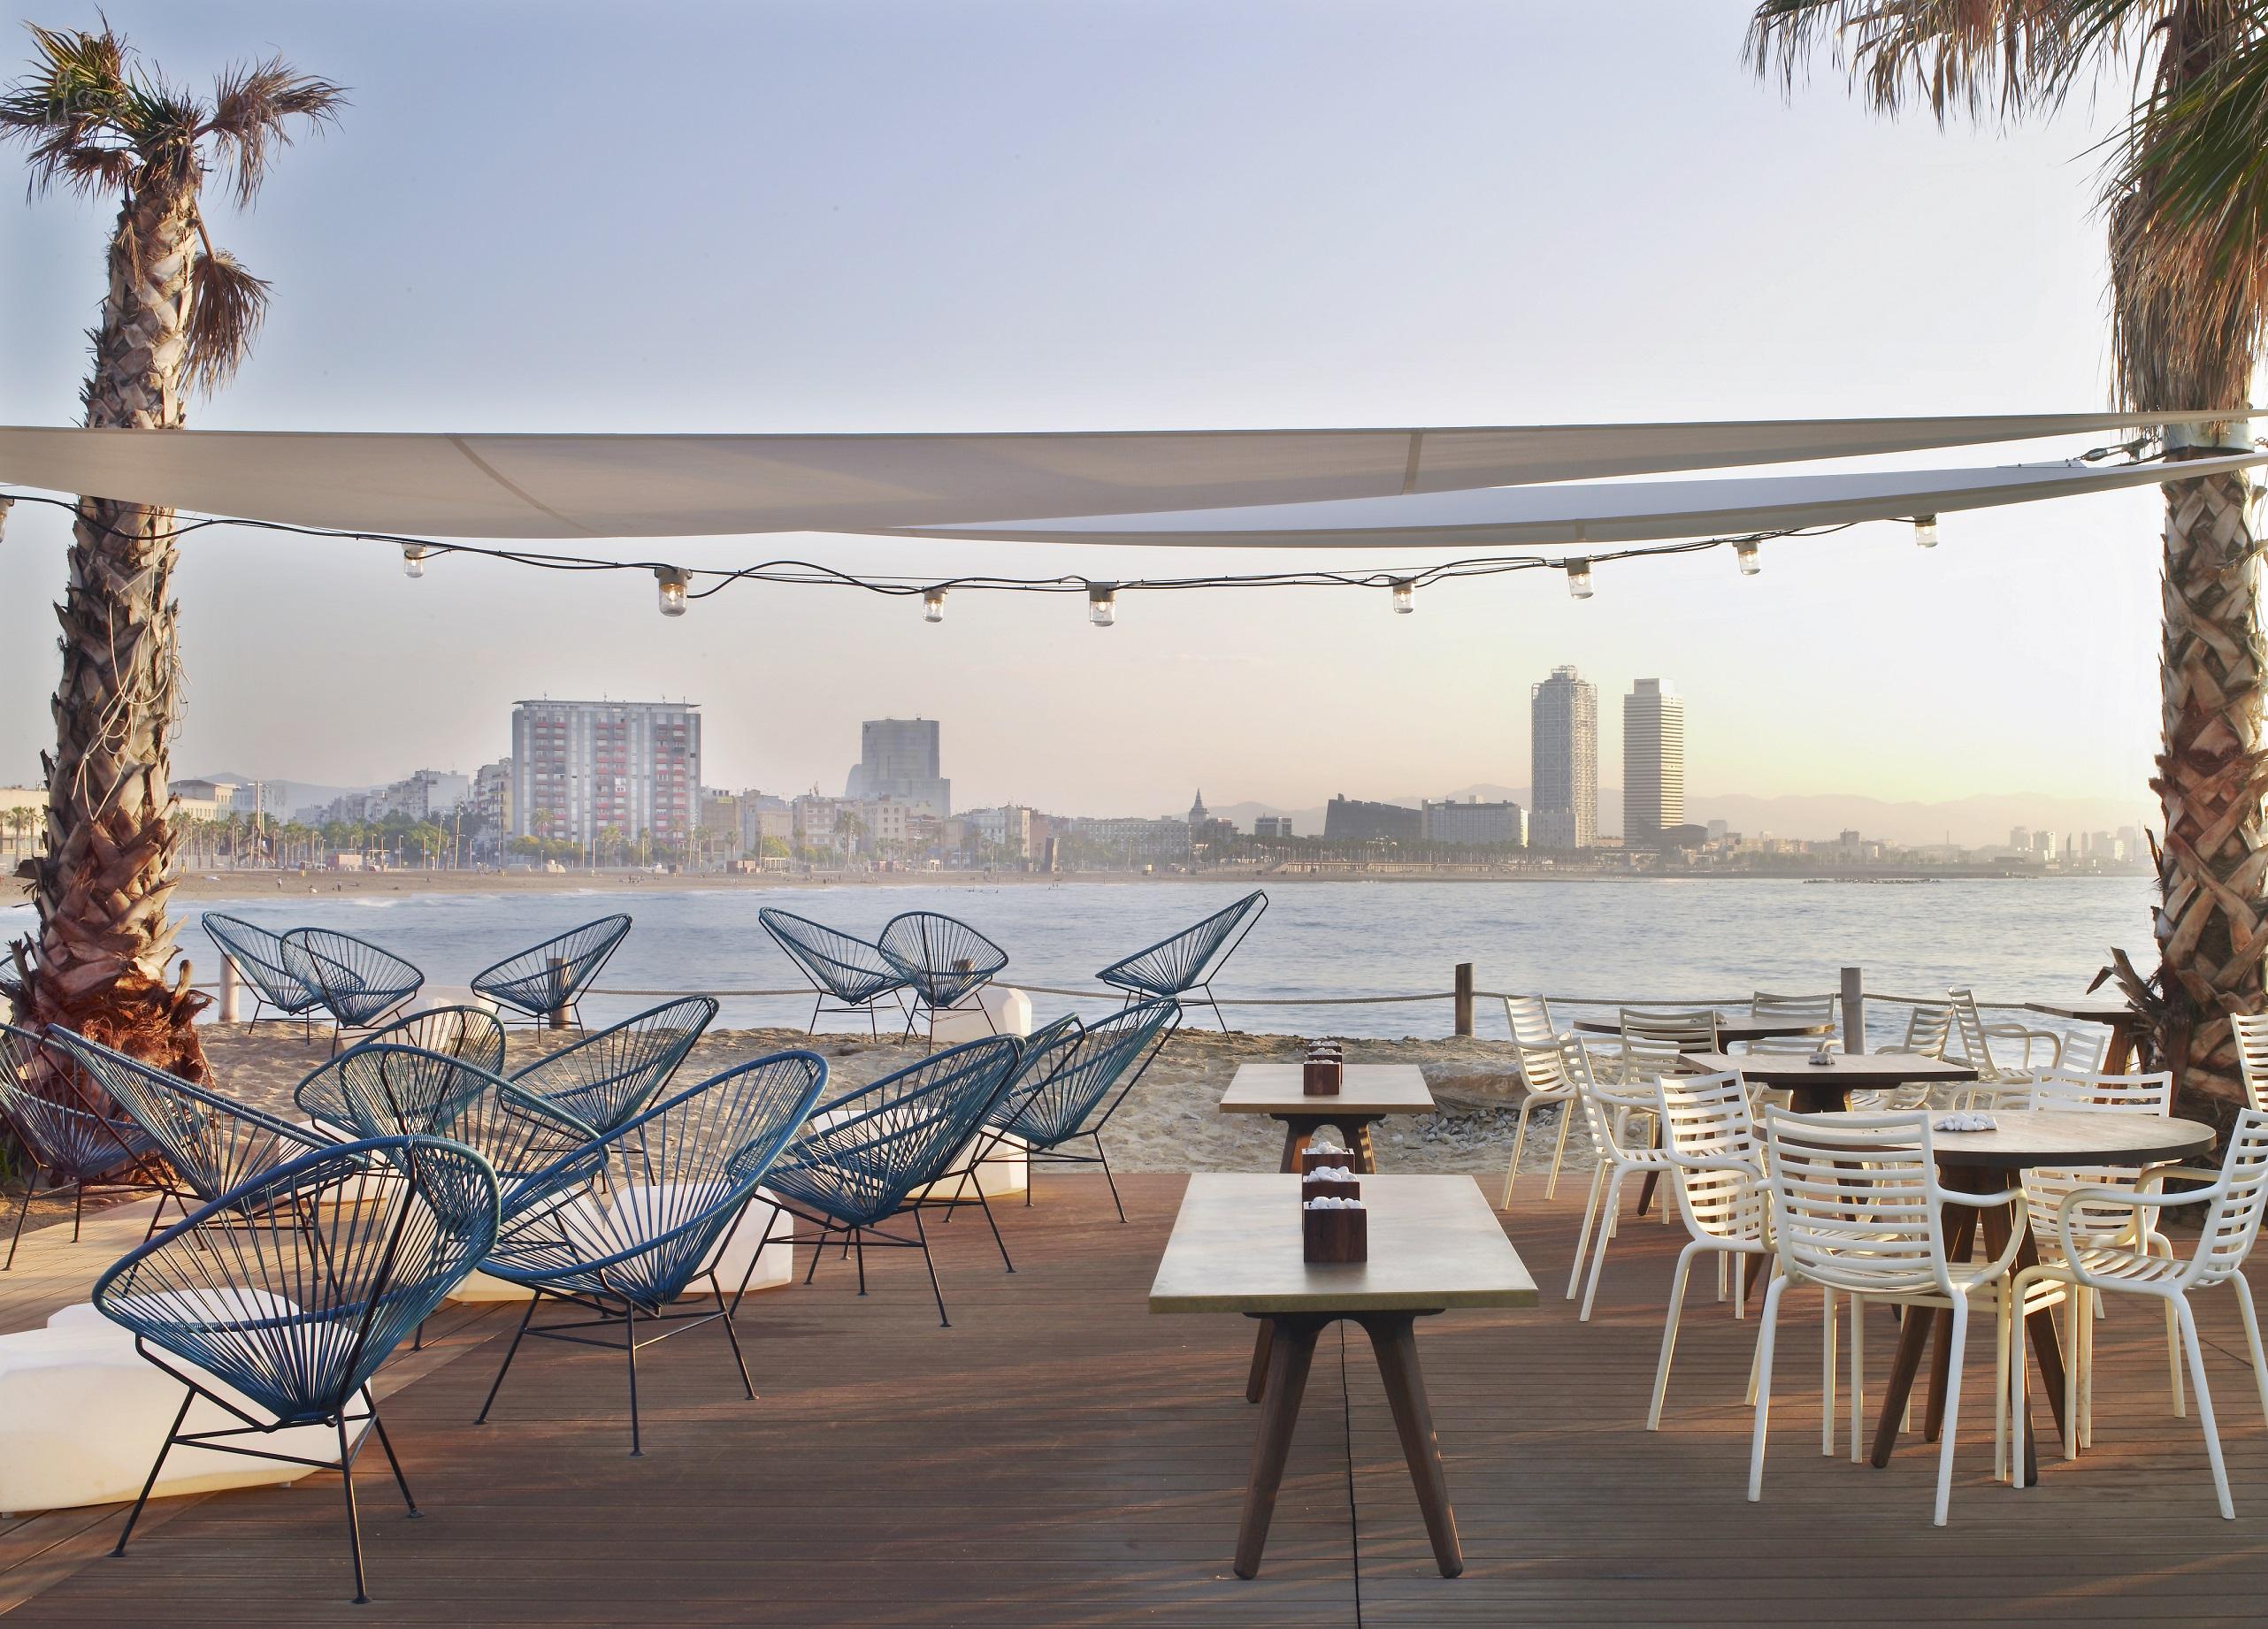 Spain 39 s swankiest seaside lounges huffpost for Beach club barcelona